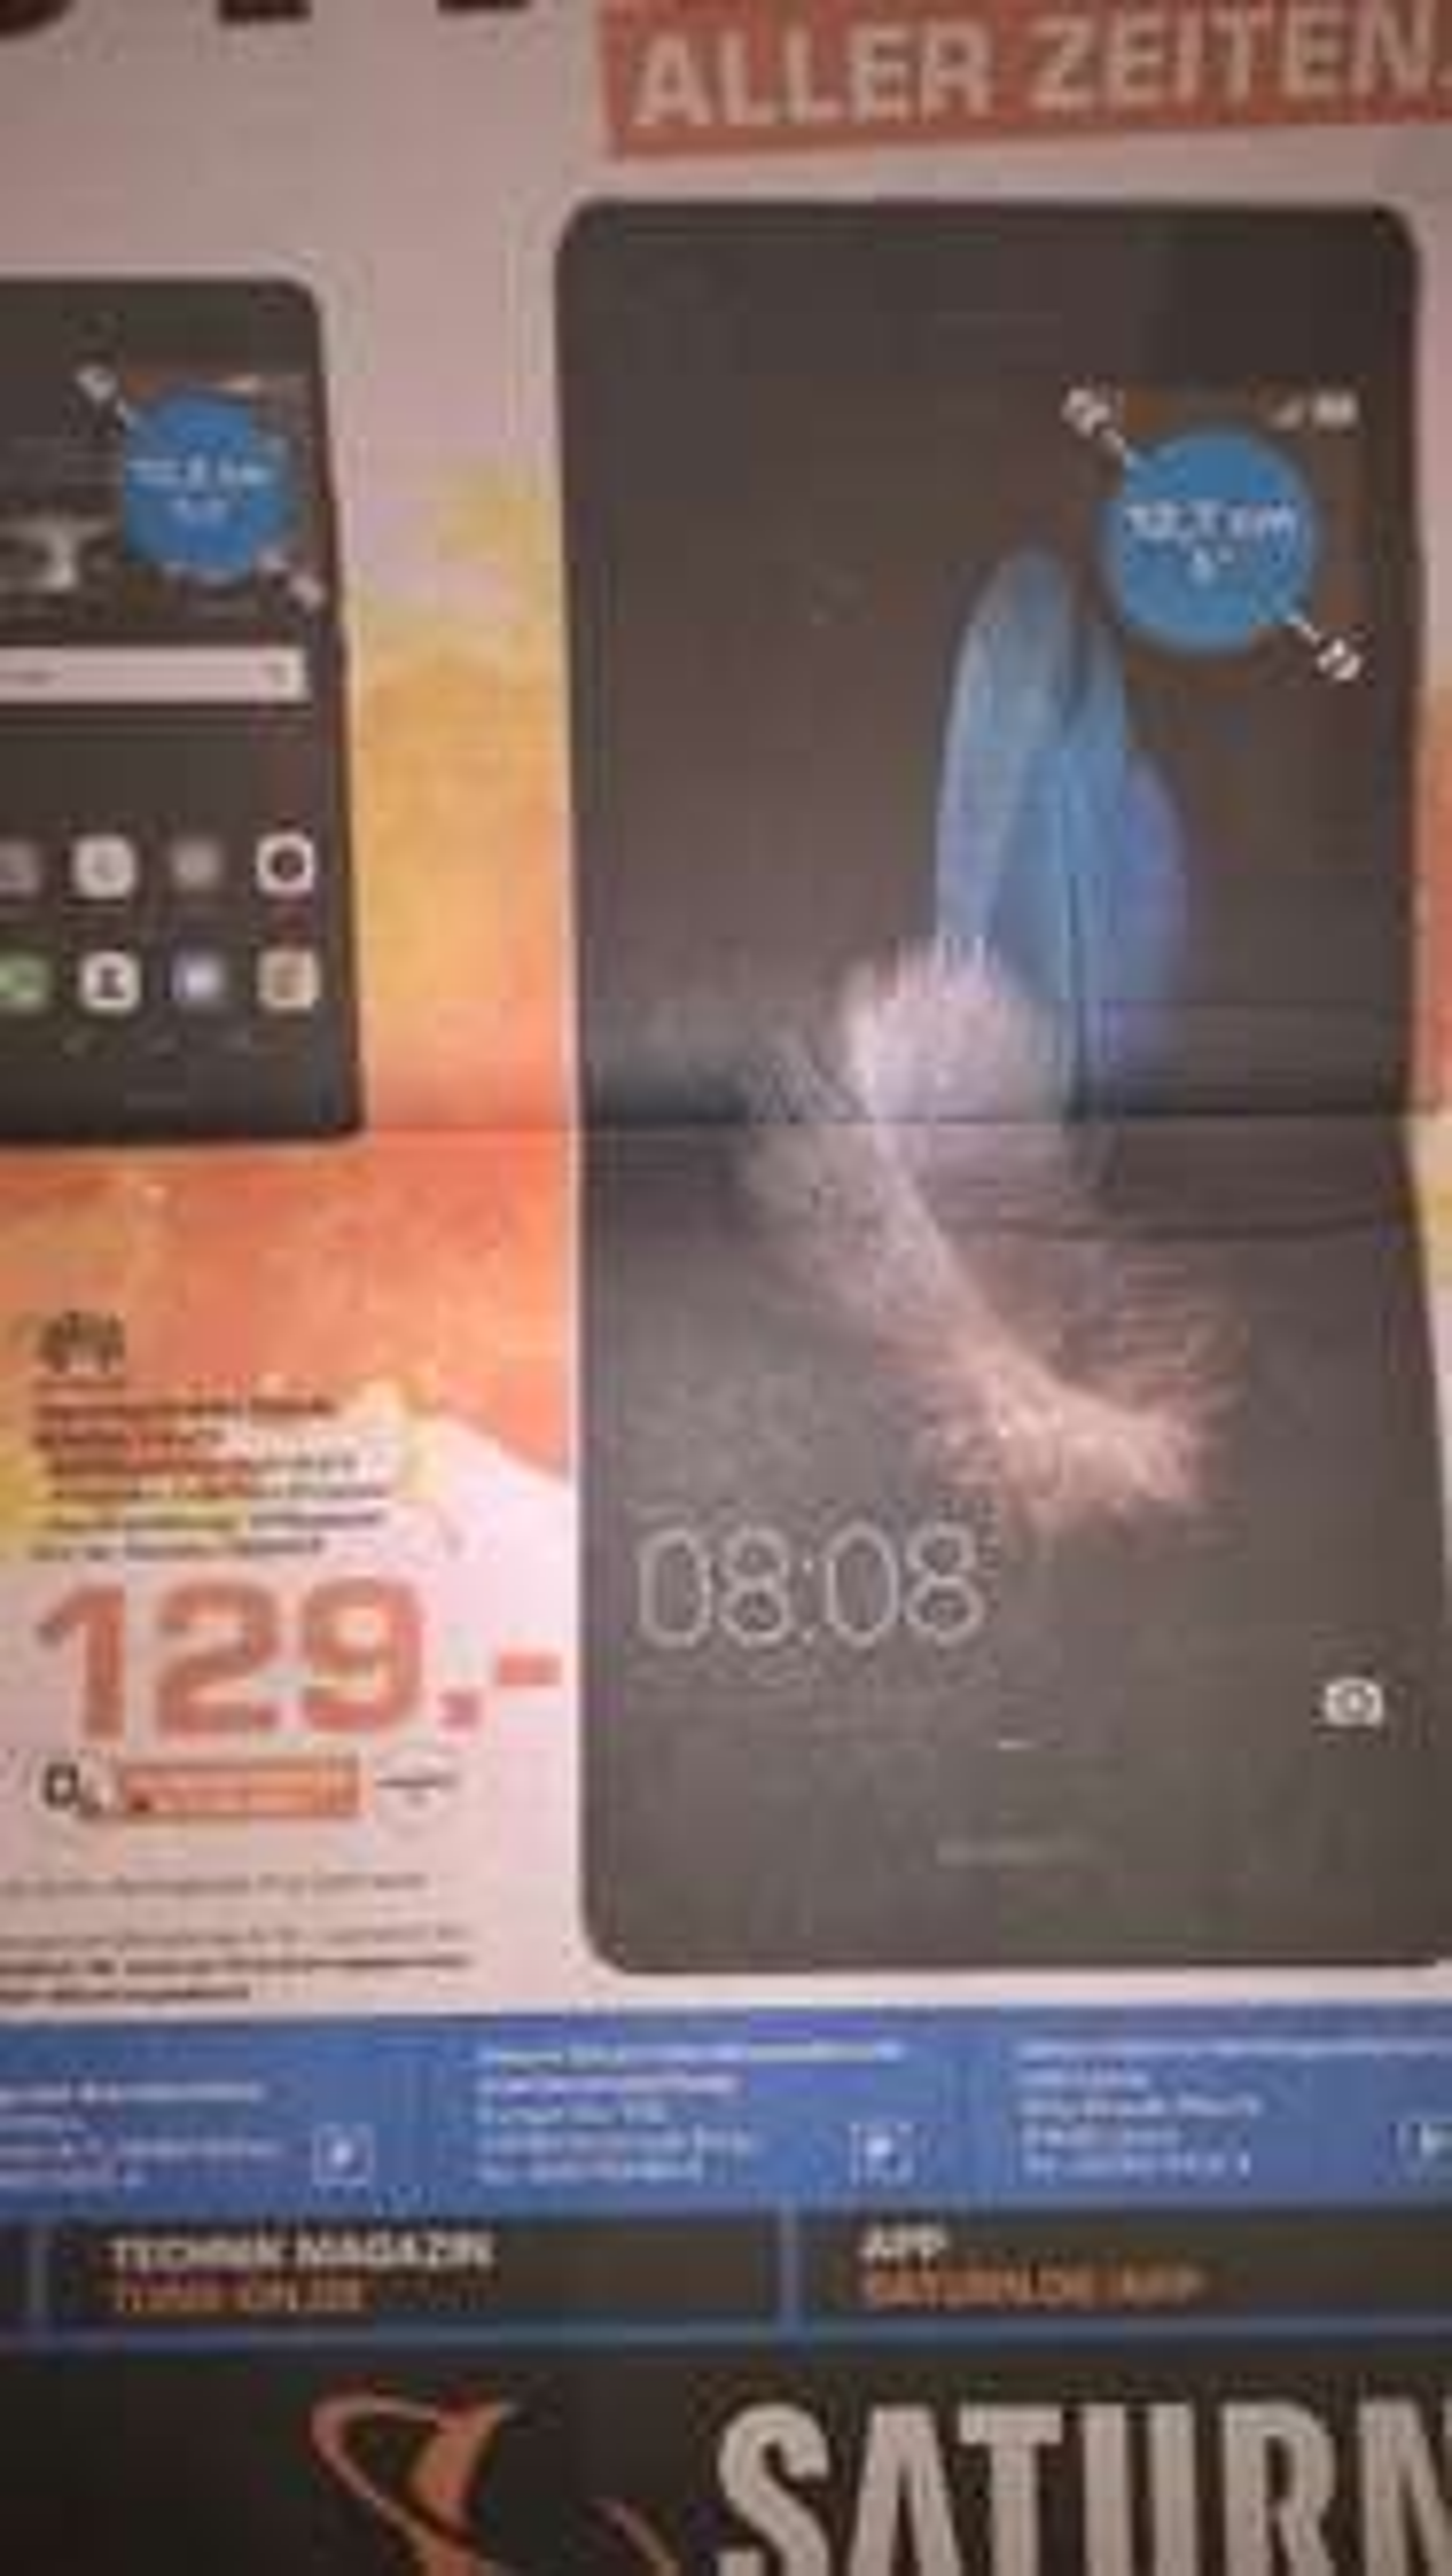 [Lokal Saturn Dortmund, Lünen, Witten] Huawei Ascend P8 Lite Dualsim (Hybrid-Slot) mit 5'' Display, 2 GB RAM